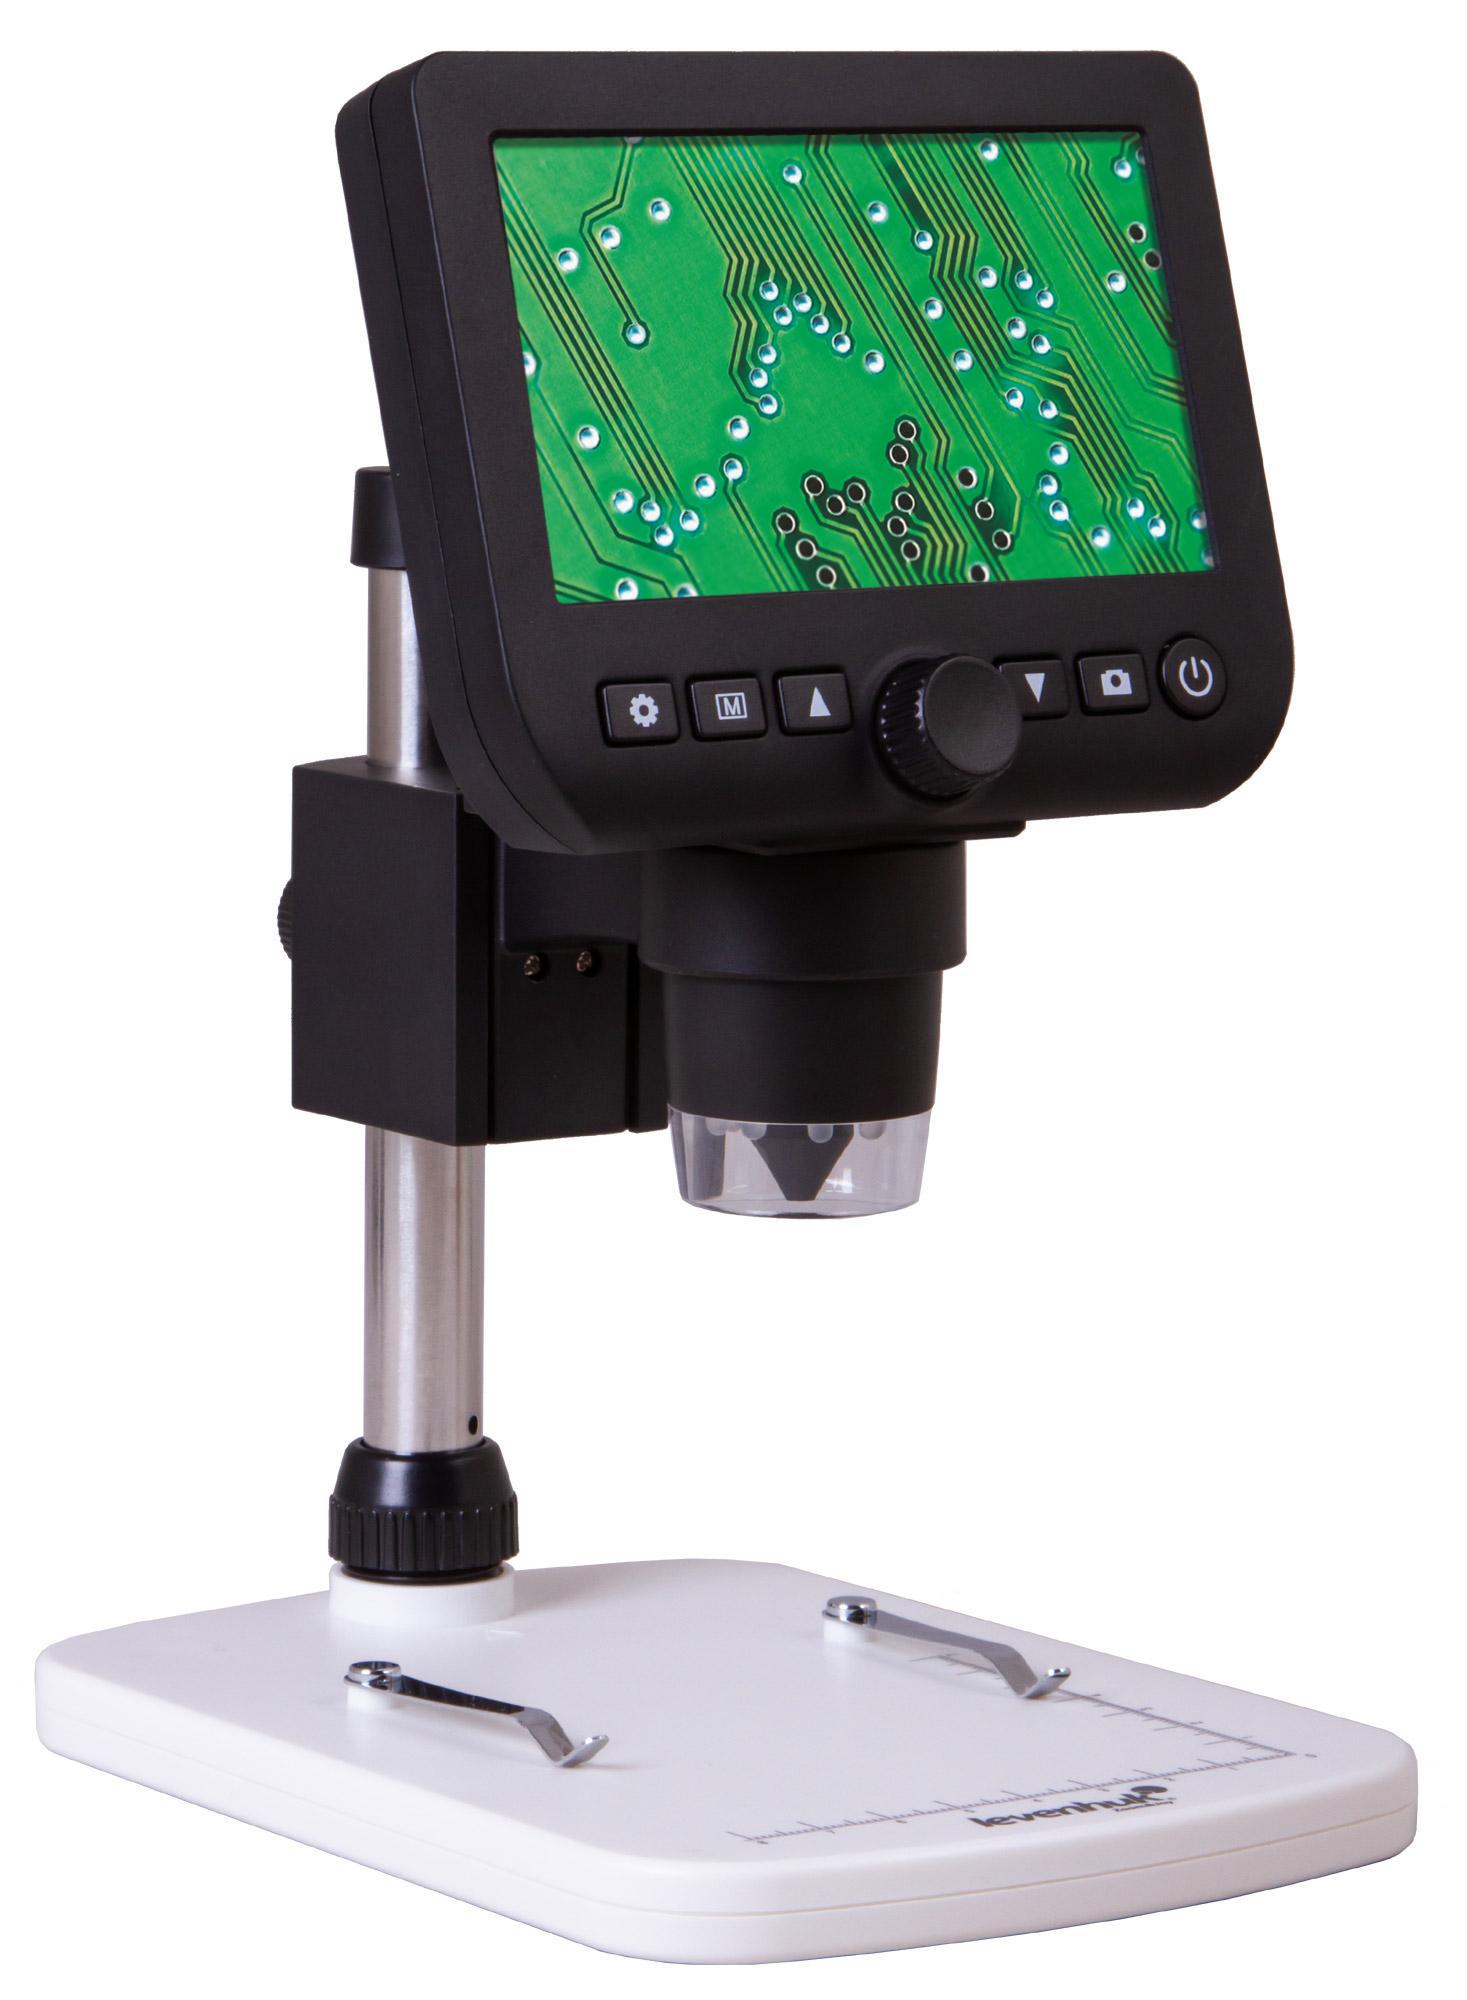 Картинка для Микроскоп цифровой Levenhuk (Левенгук) DTX 350 LCD